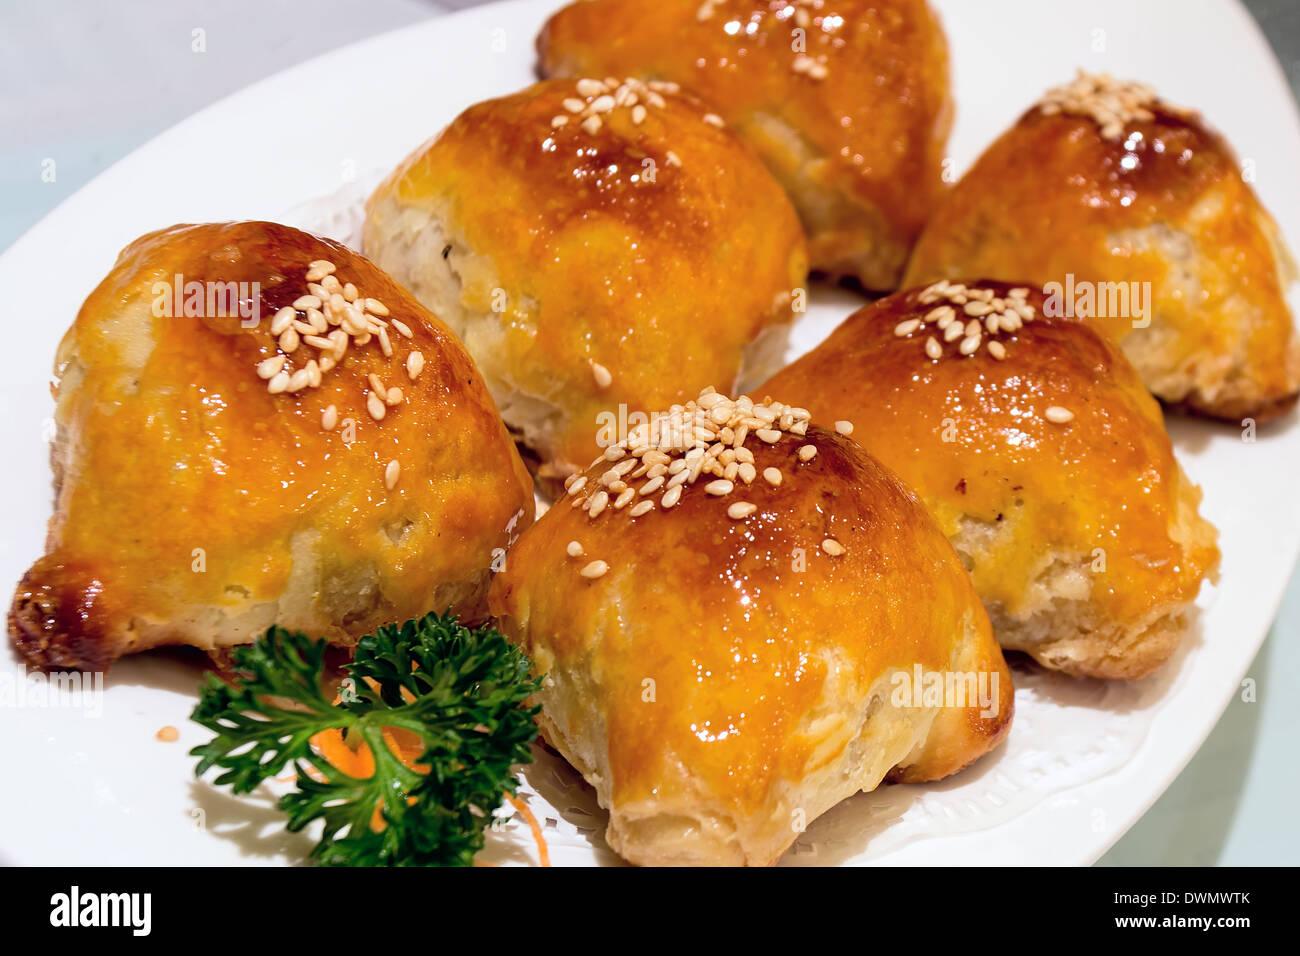 Char Siu Sou Barbecue Pork Pastry Dim Sum Dish Closeup macro - Stock Image